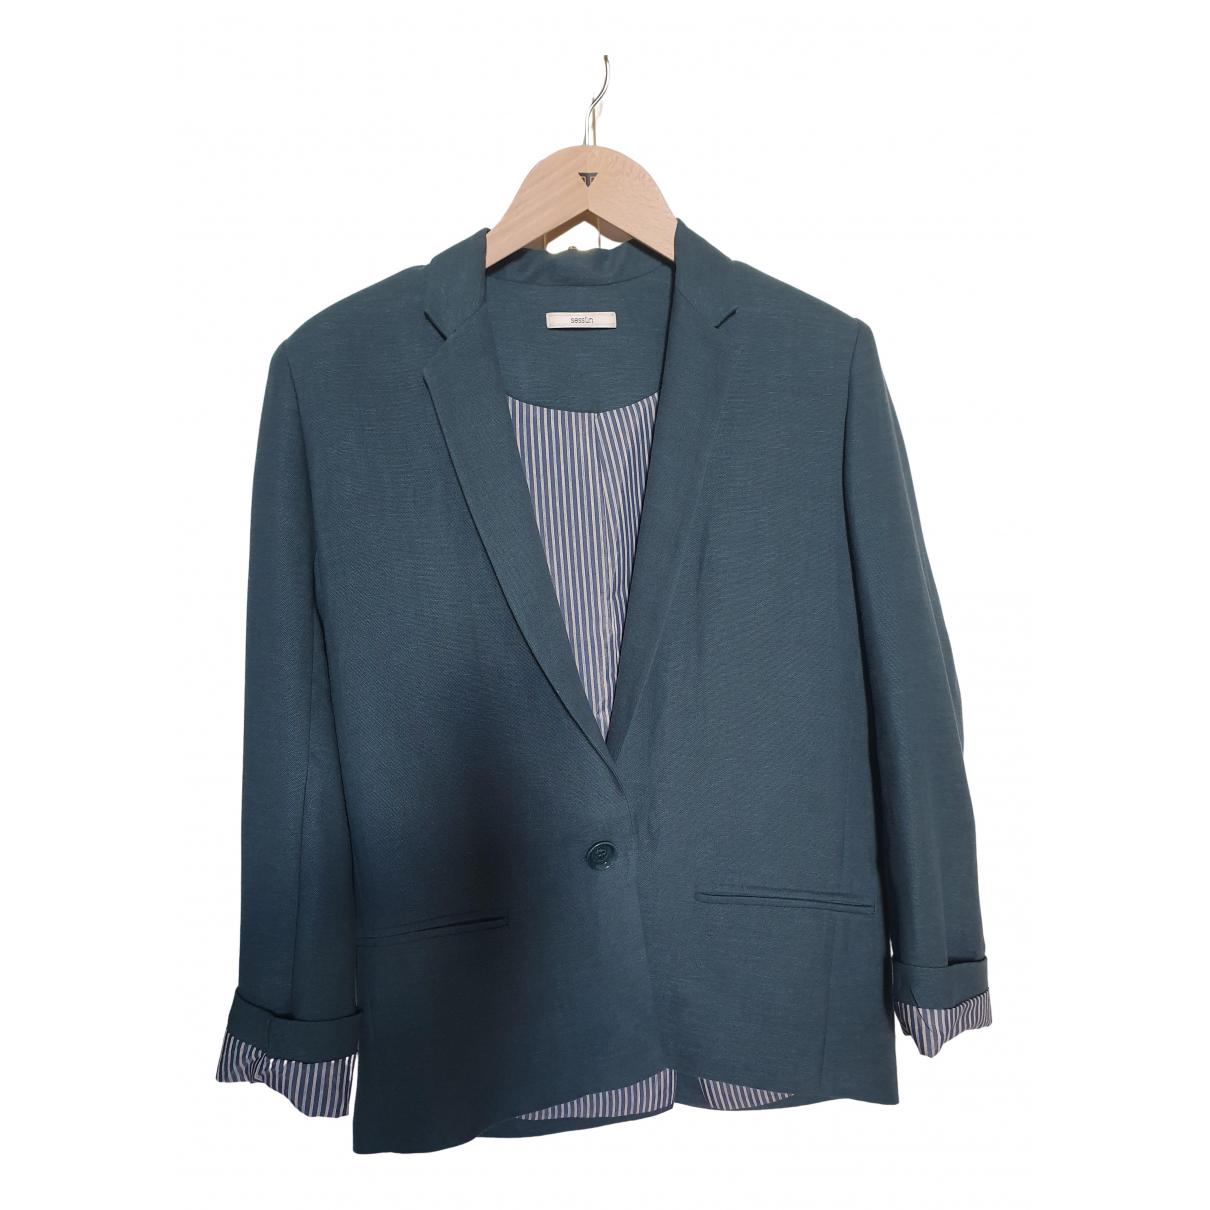 Sessun \N Jacke in  Gruen Polyester